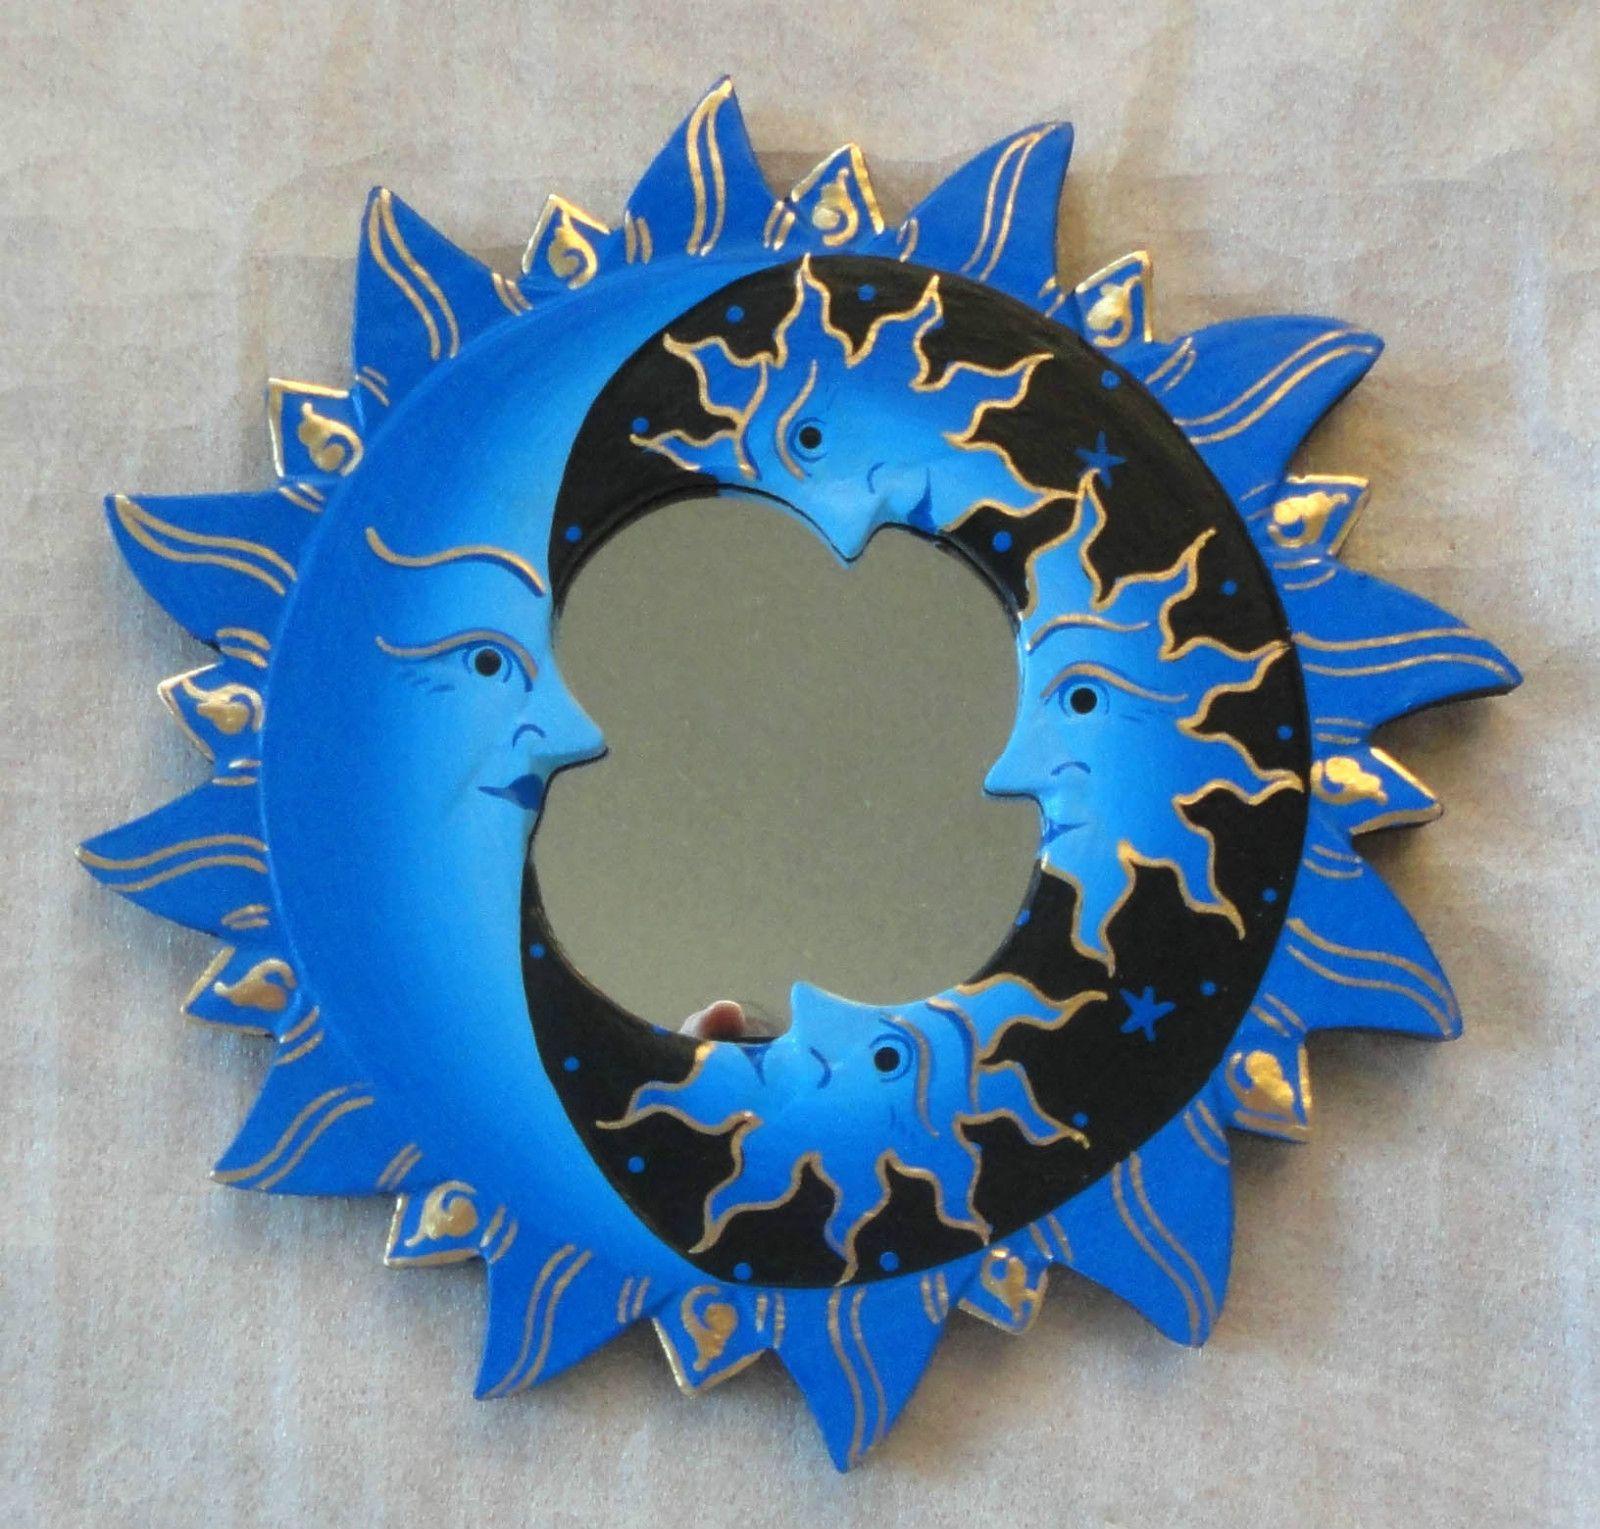 Blue black wall mirror feng shui decor painted wood celestial moon